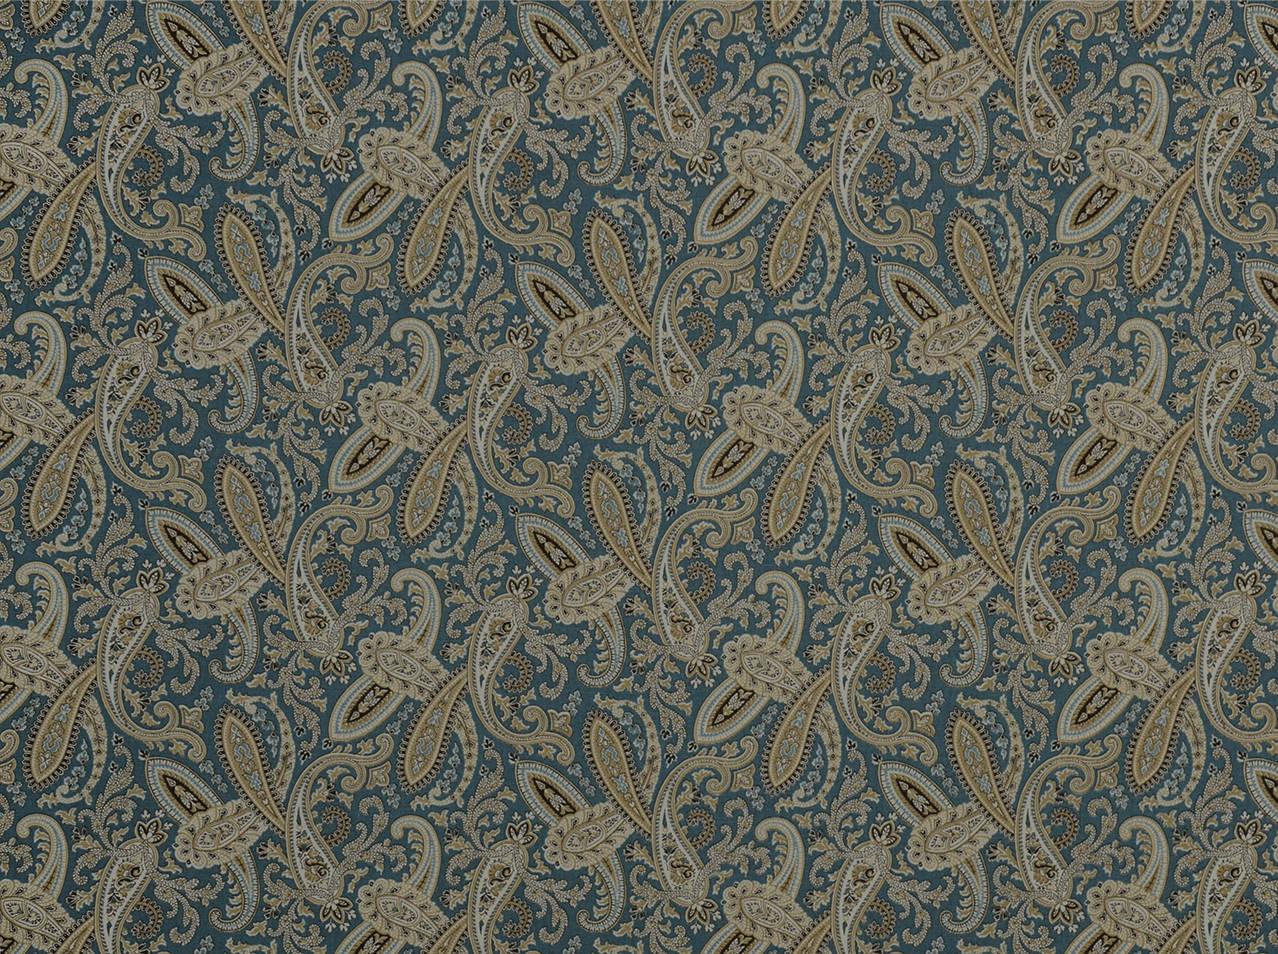 covington fabric and design products covington prints covington fabric and design products covington prints ballard 5 blue